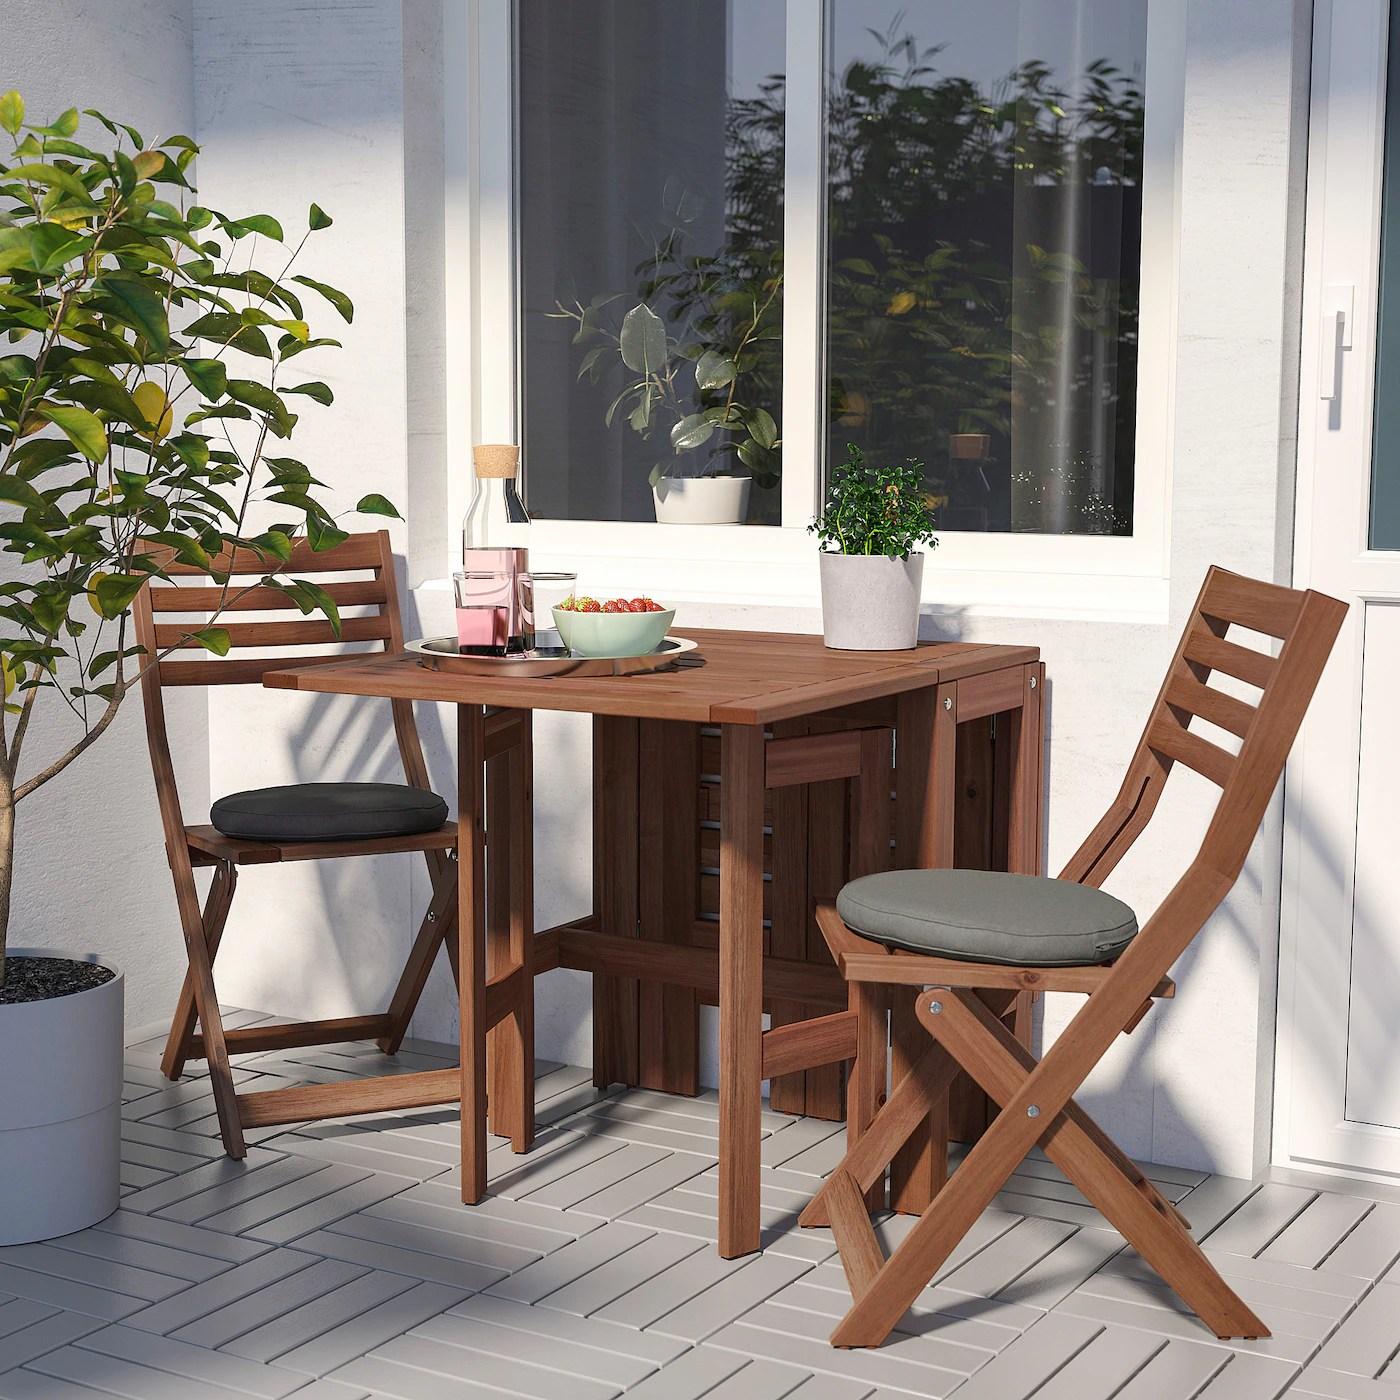 Applaro Table De Jardin Pliante Teinte Brun 34 83 131x70 Cm Ikea Ikea